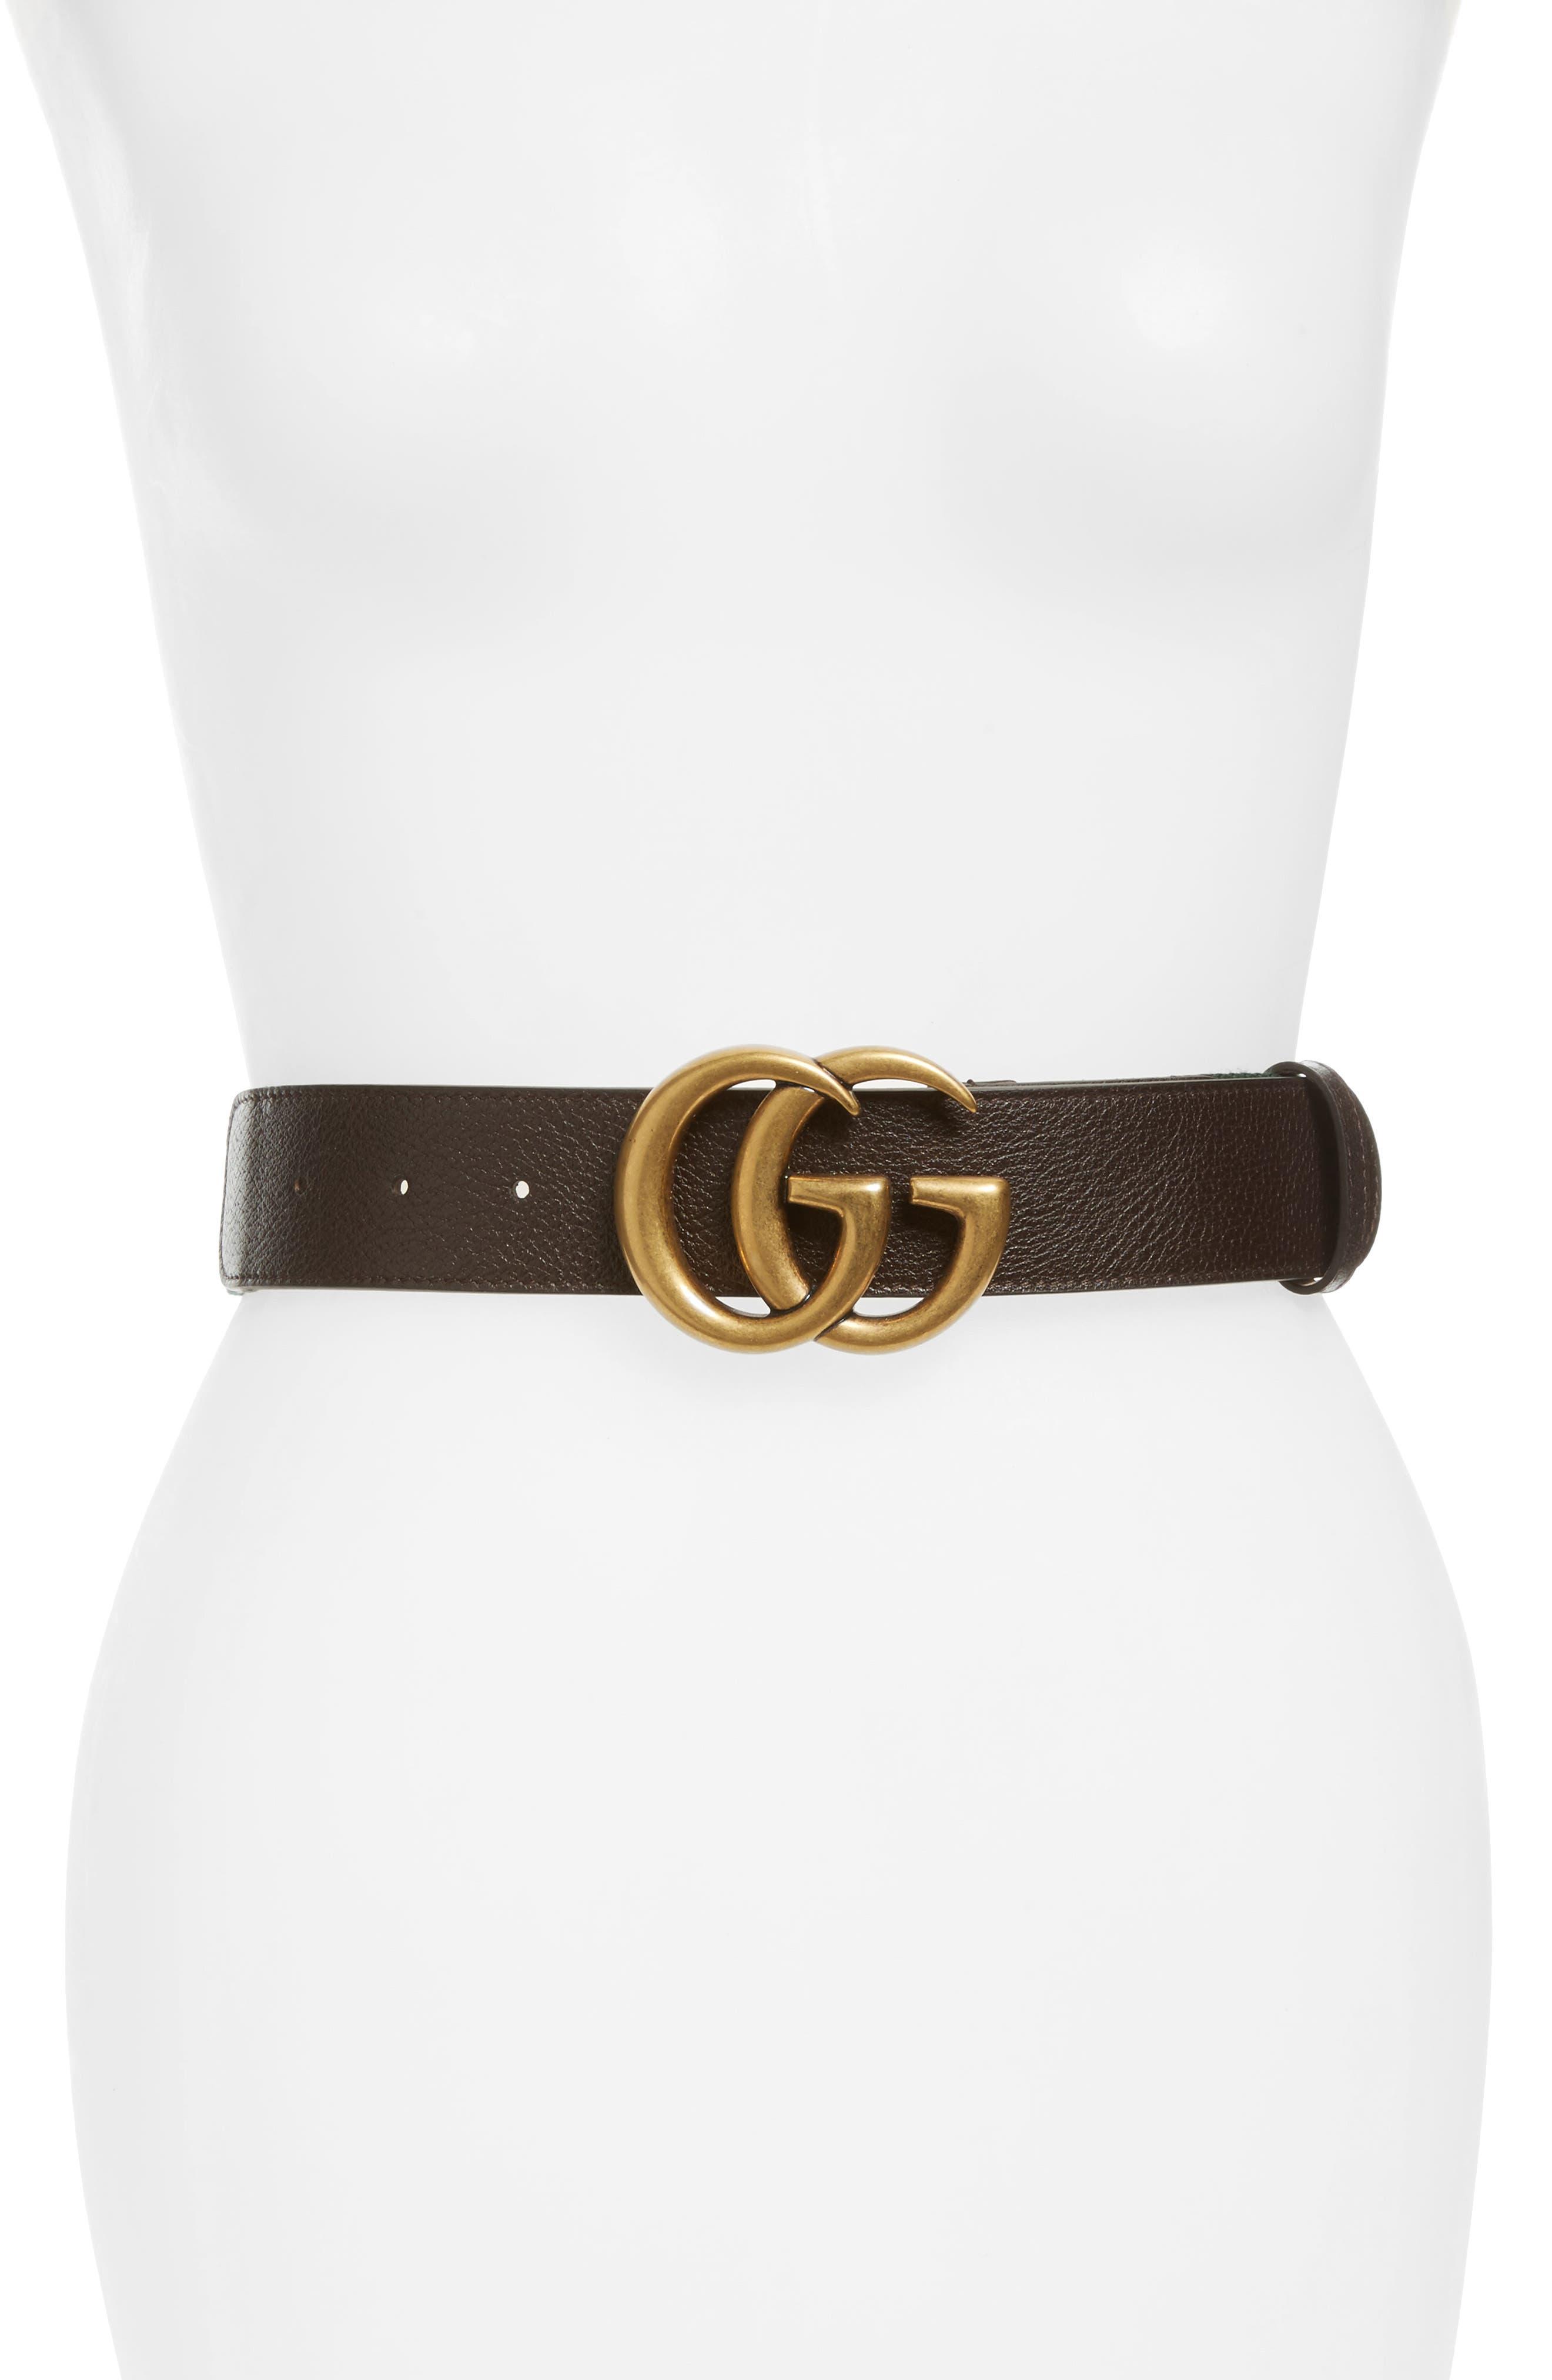 Main Image - Gucci Double G Leather & Web Belt